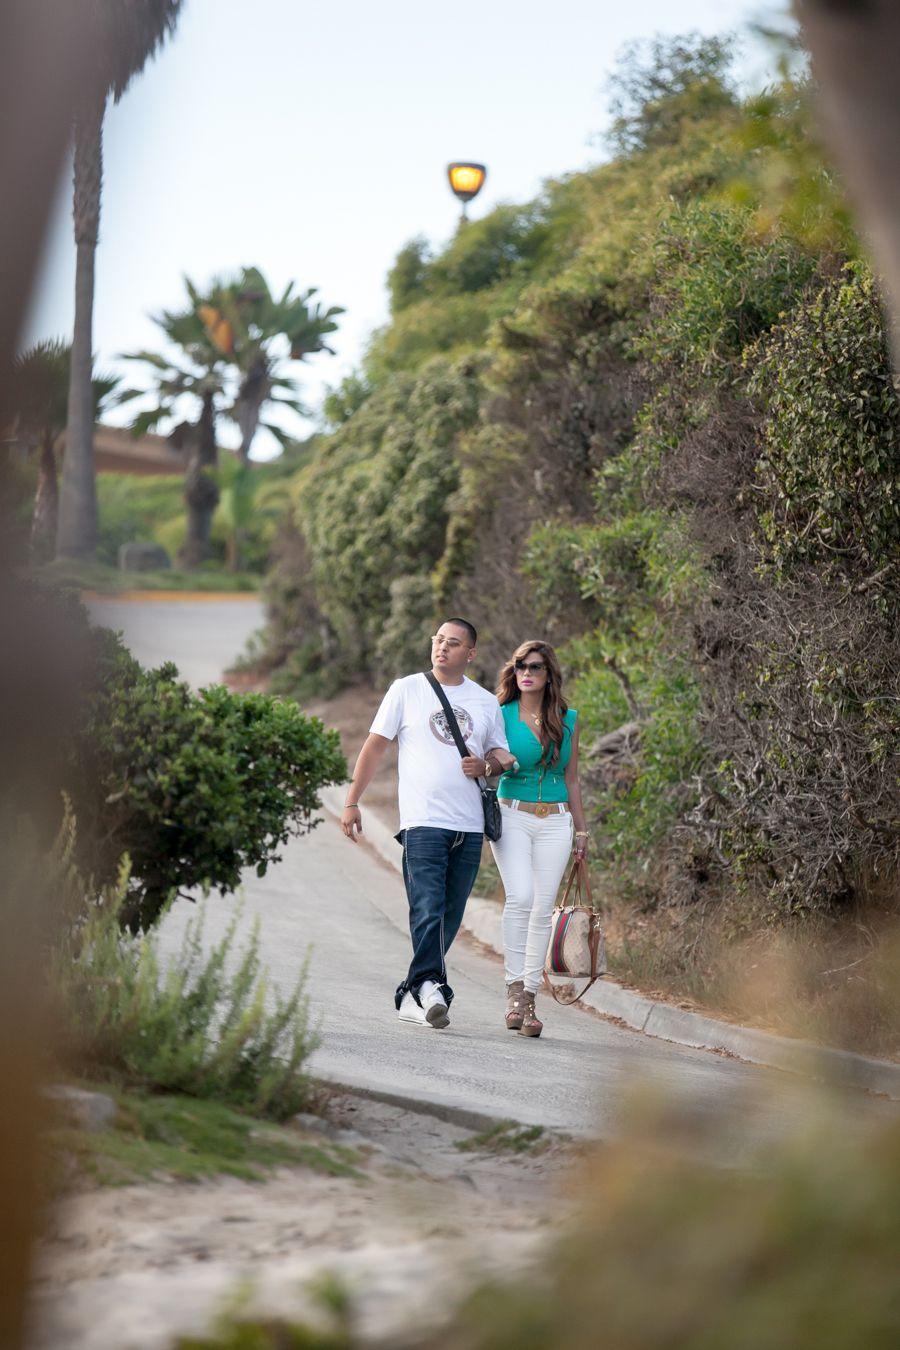 oc proposal ideas Sand Castle Marriage Proposal in Orange County